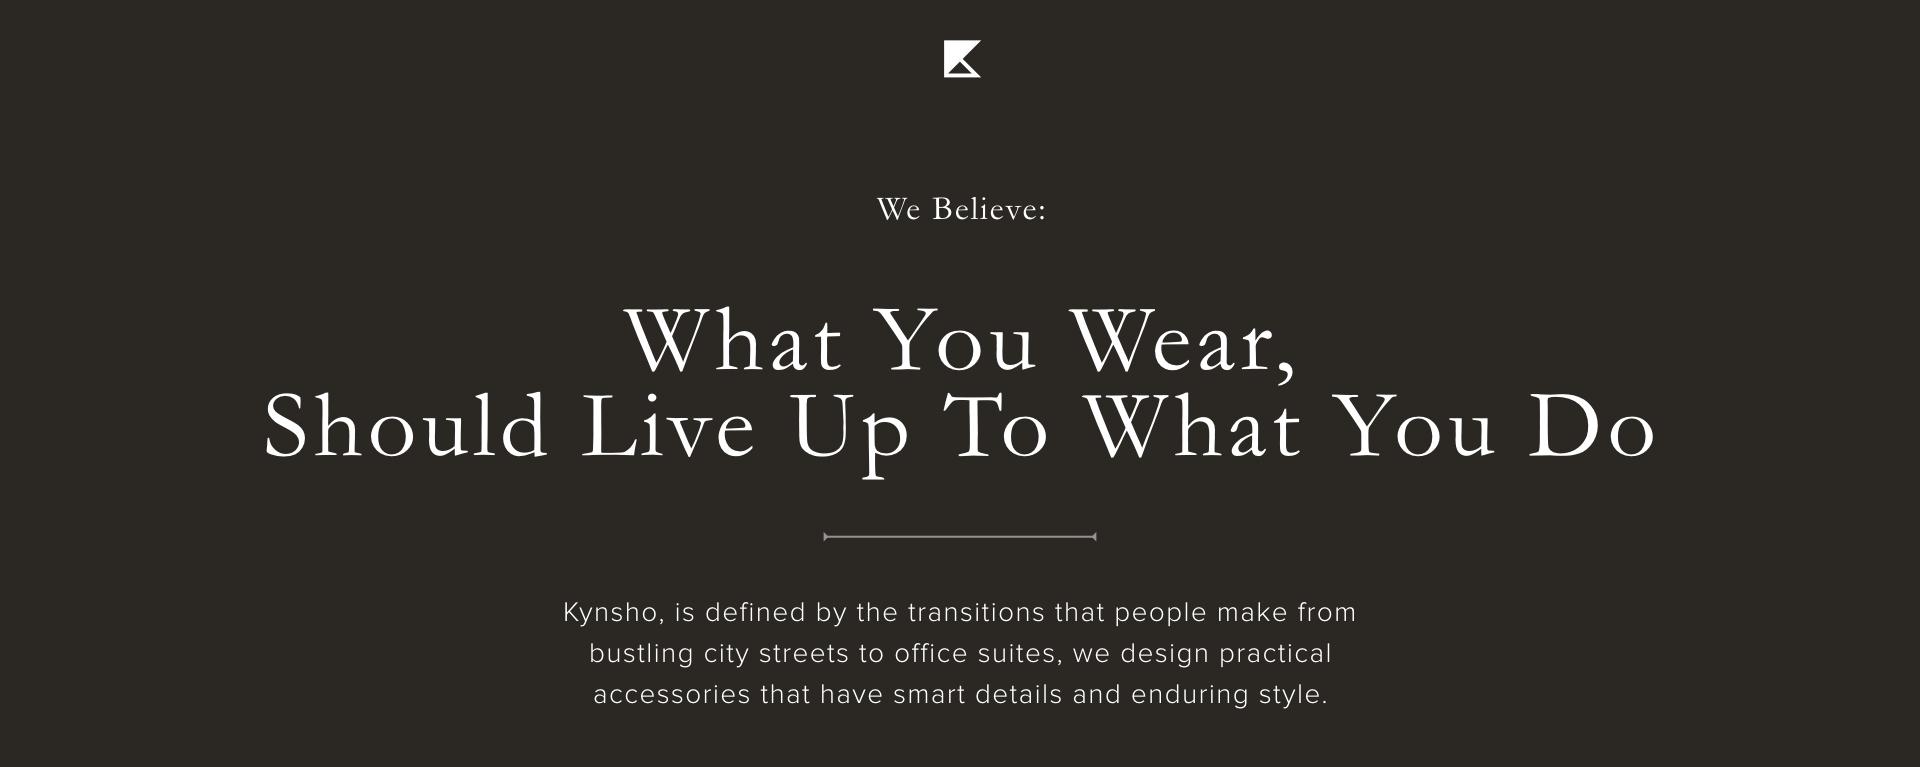 _we believe_what you wear_brown.001.jpeg